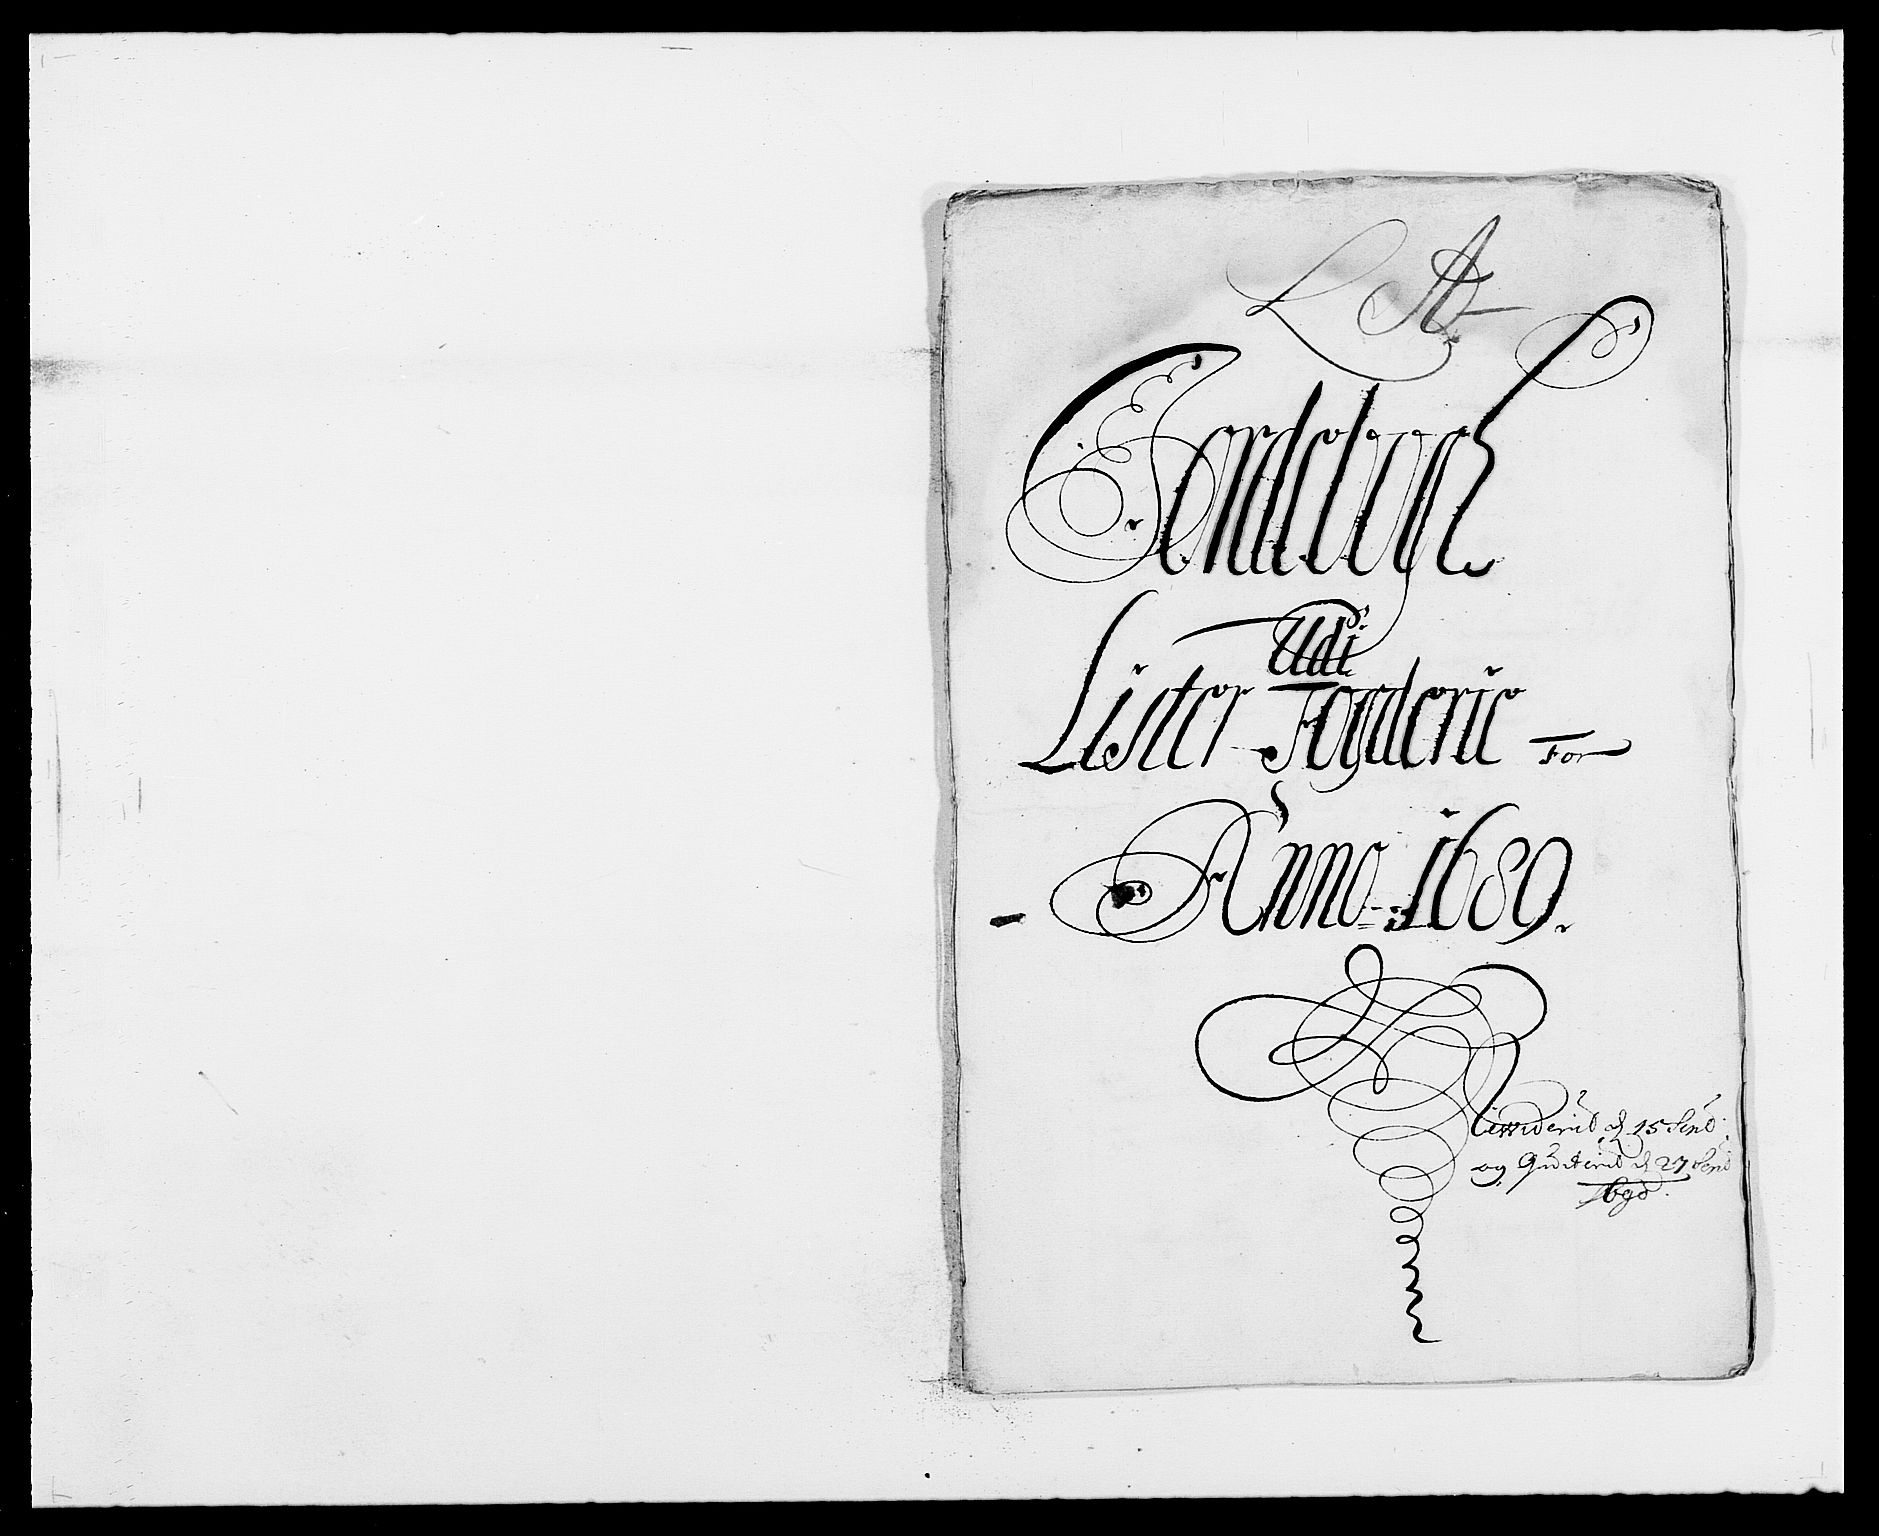 RA, Rentekammeret inntil 1814, Reviderte regnskaper, Fogderegnskap, R41/L2535: Fogderegnskap Lista, 1686-1689, s. 1